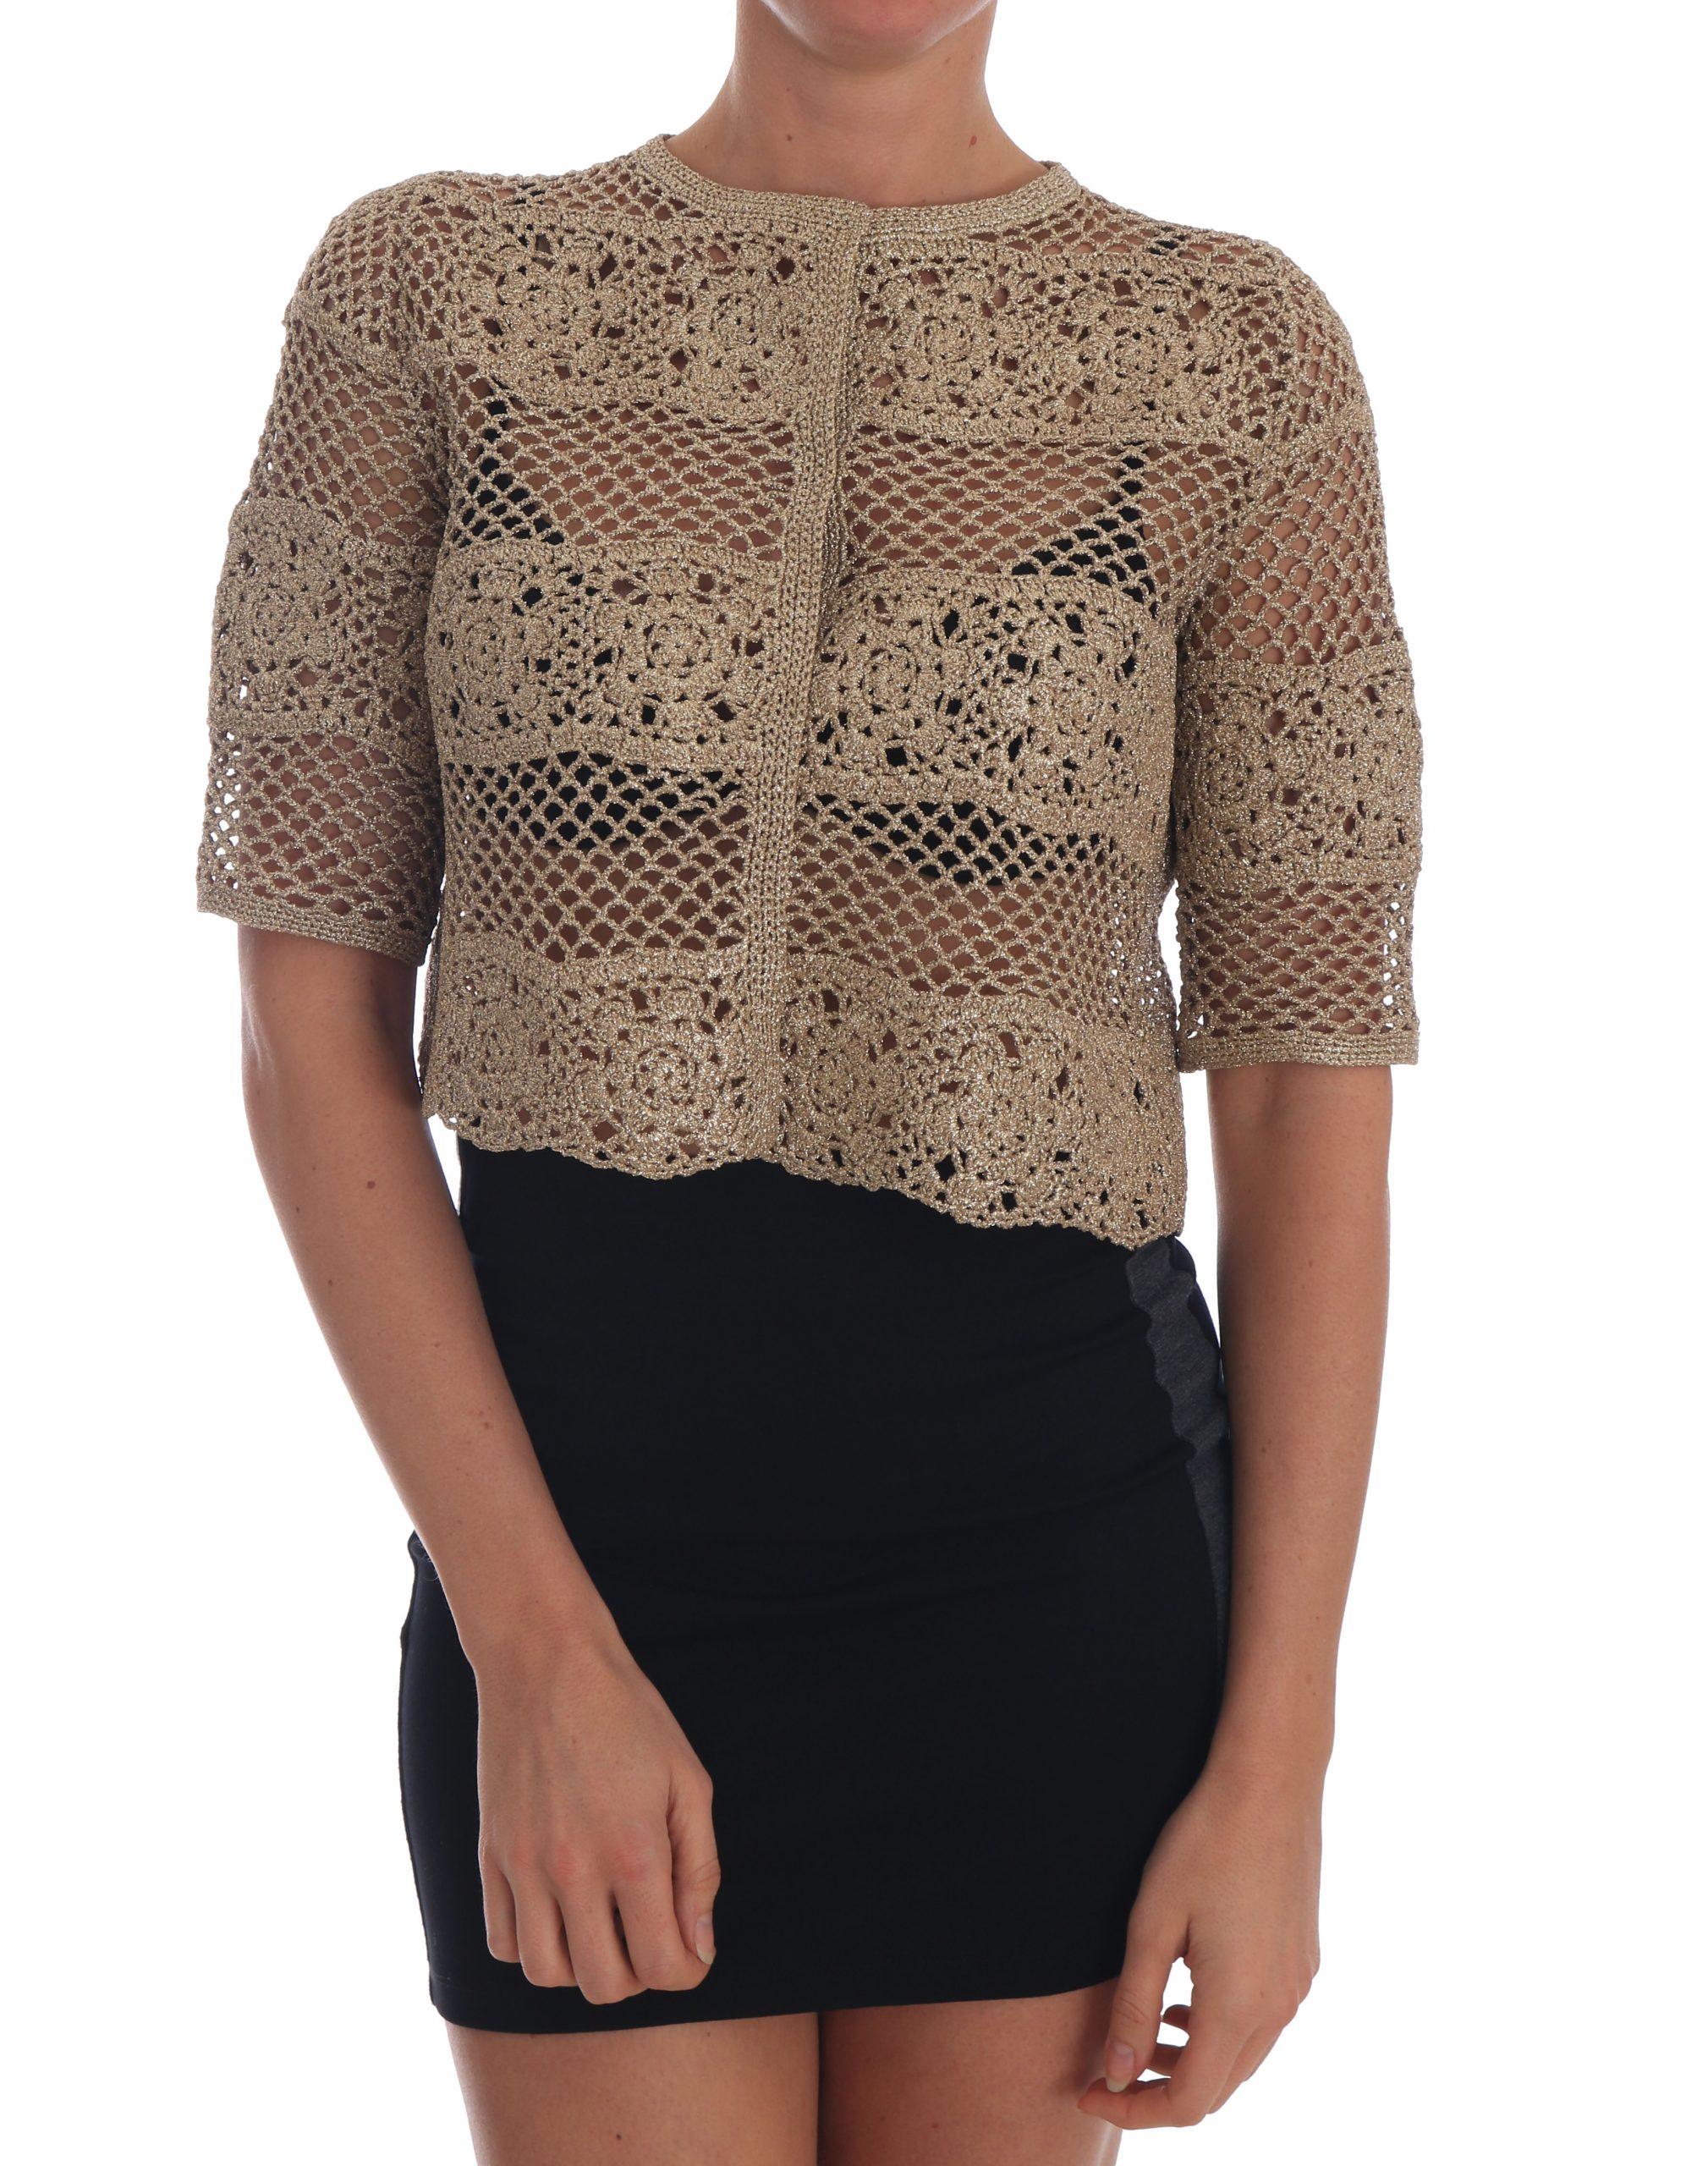 Dolce & Gabbana Women's Crochet Knitted Floral Cardigan Gold TSH1913 - IT40 S